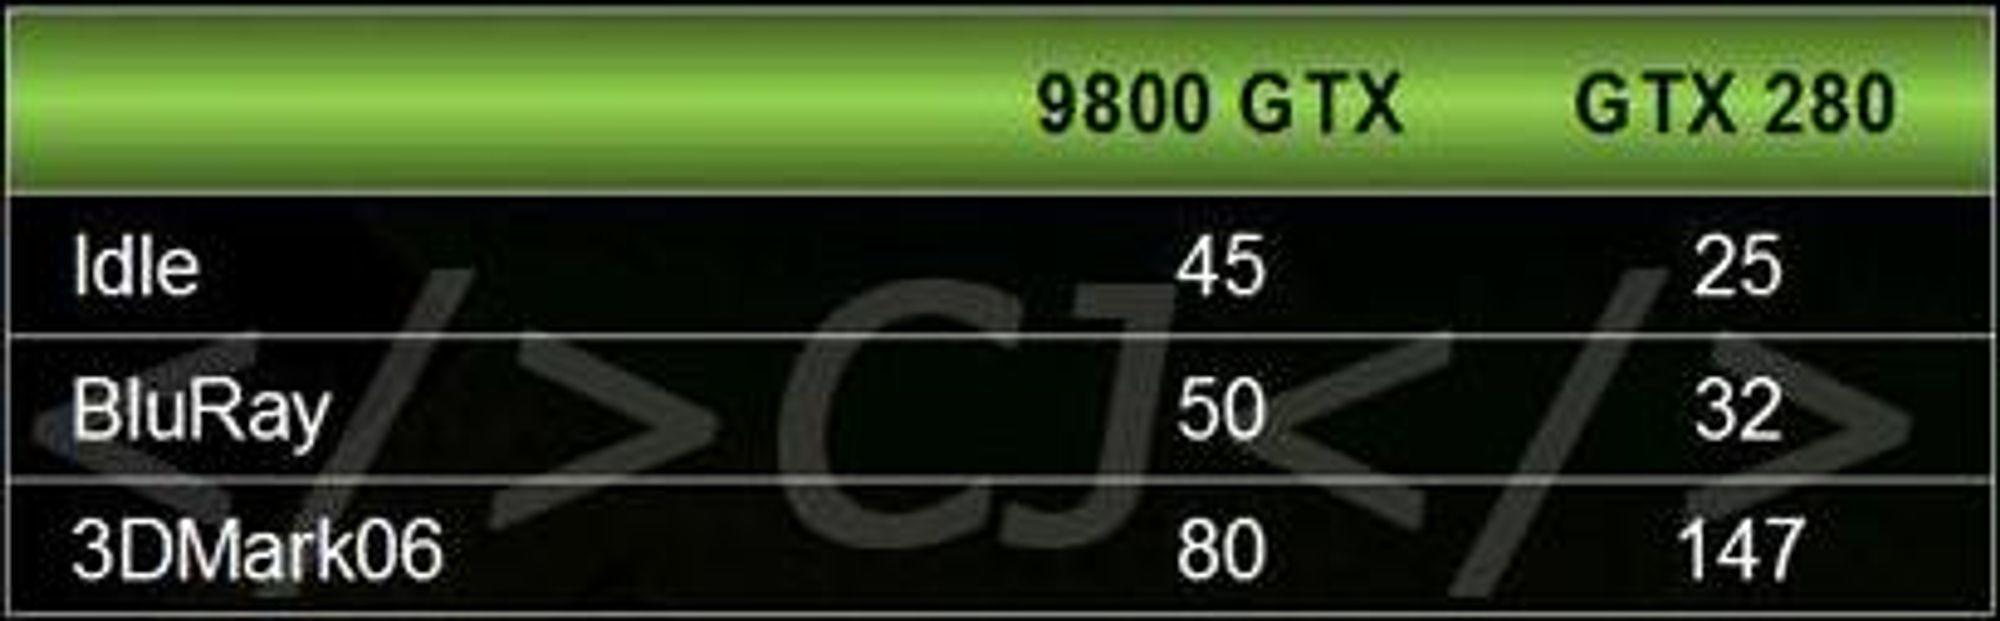 Energieffektivitet: Geforce 9800GTX vs GTX 280 målt i antall watt